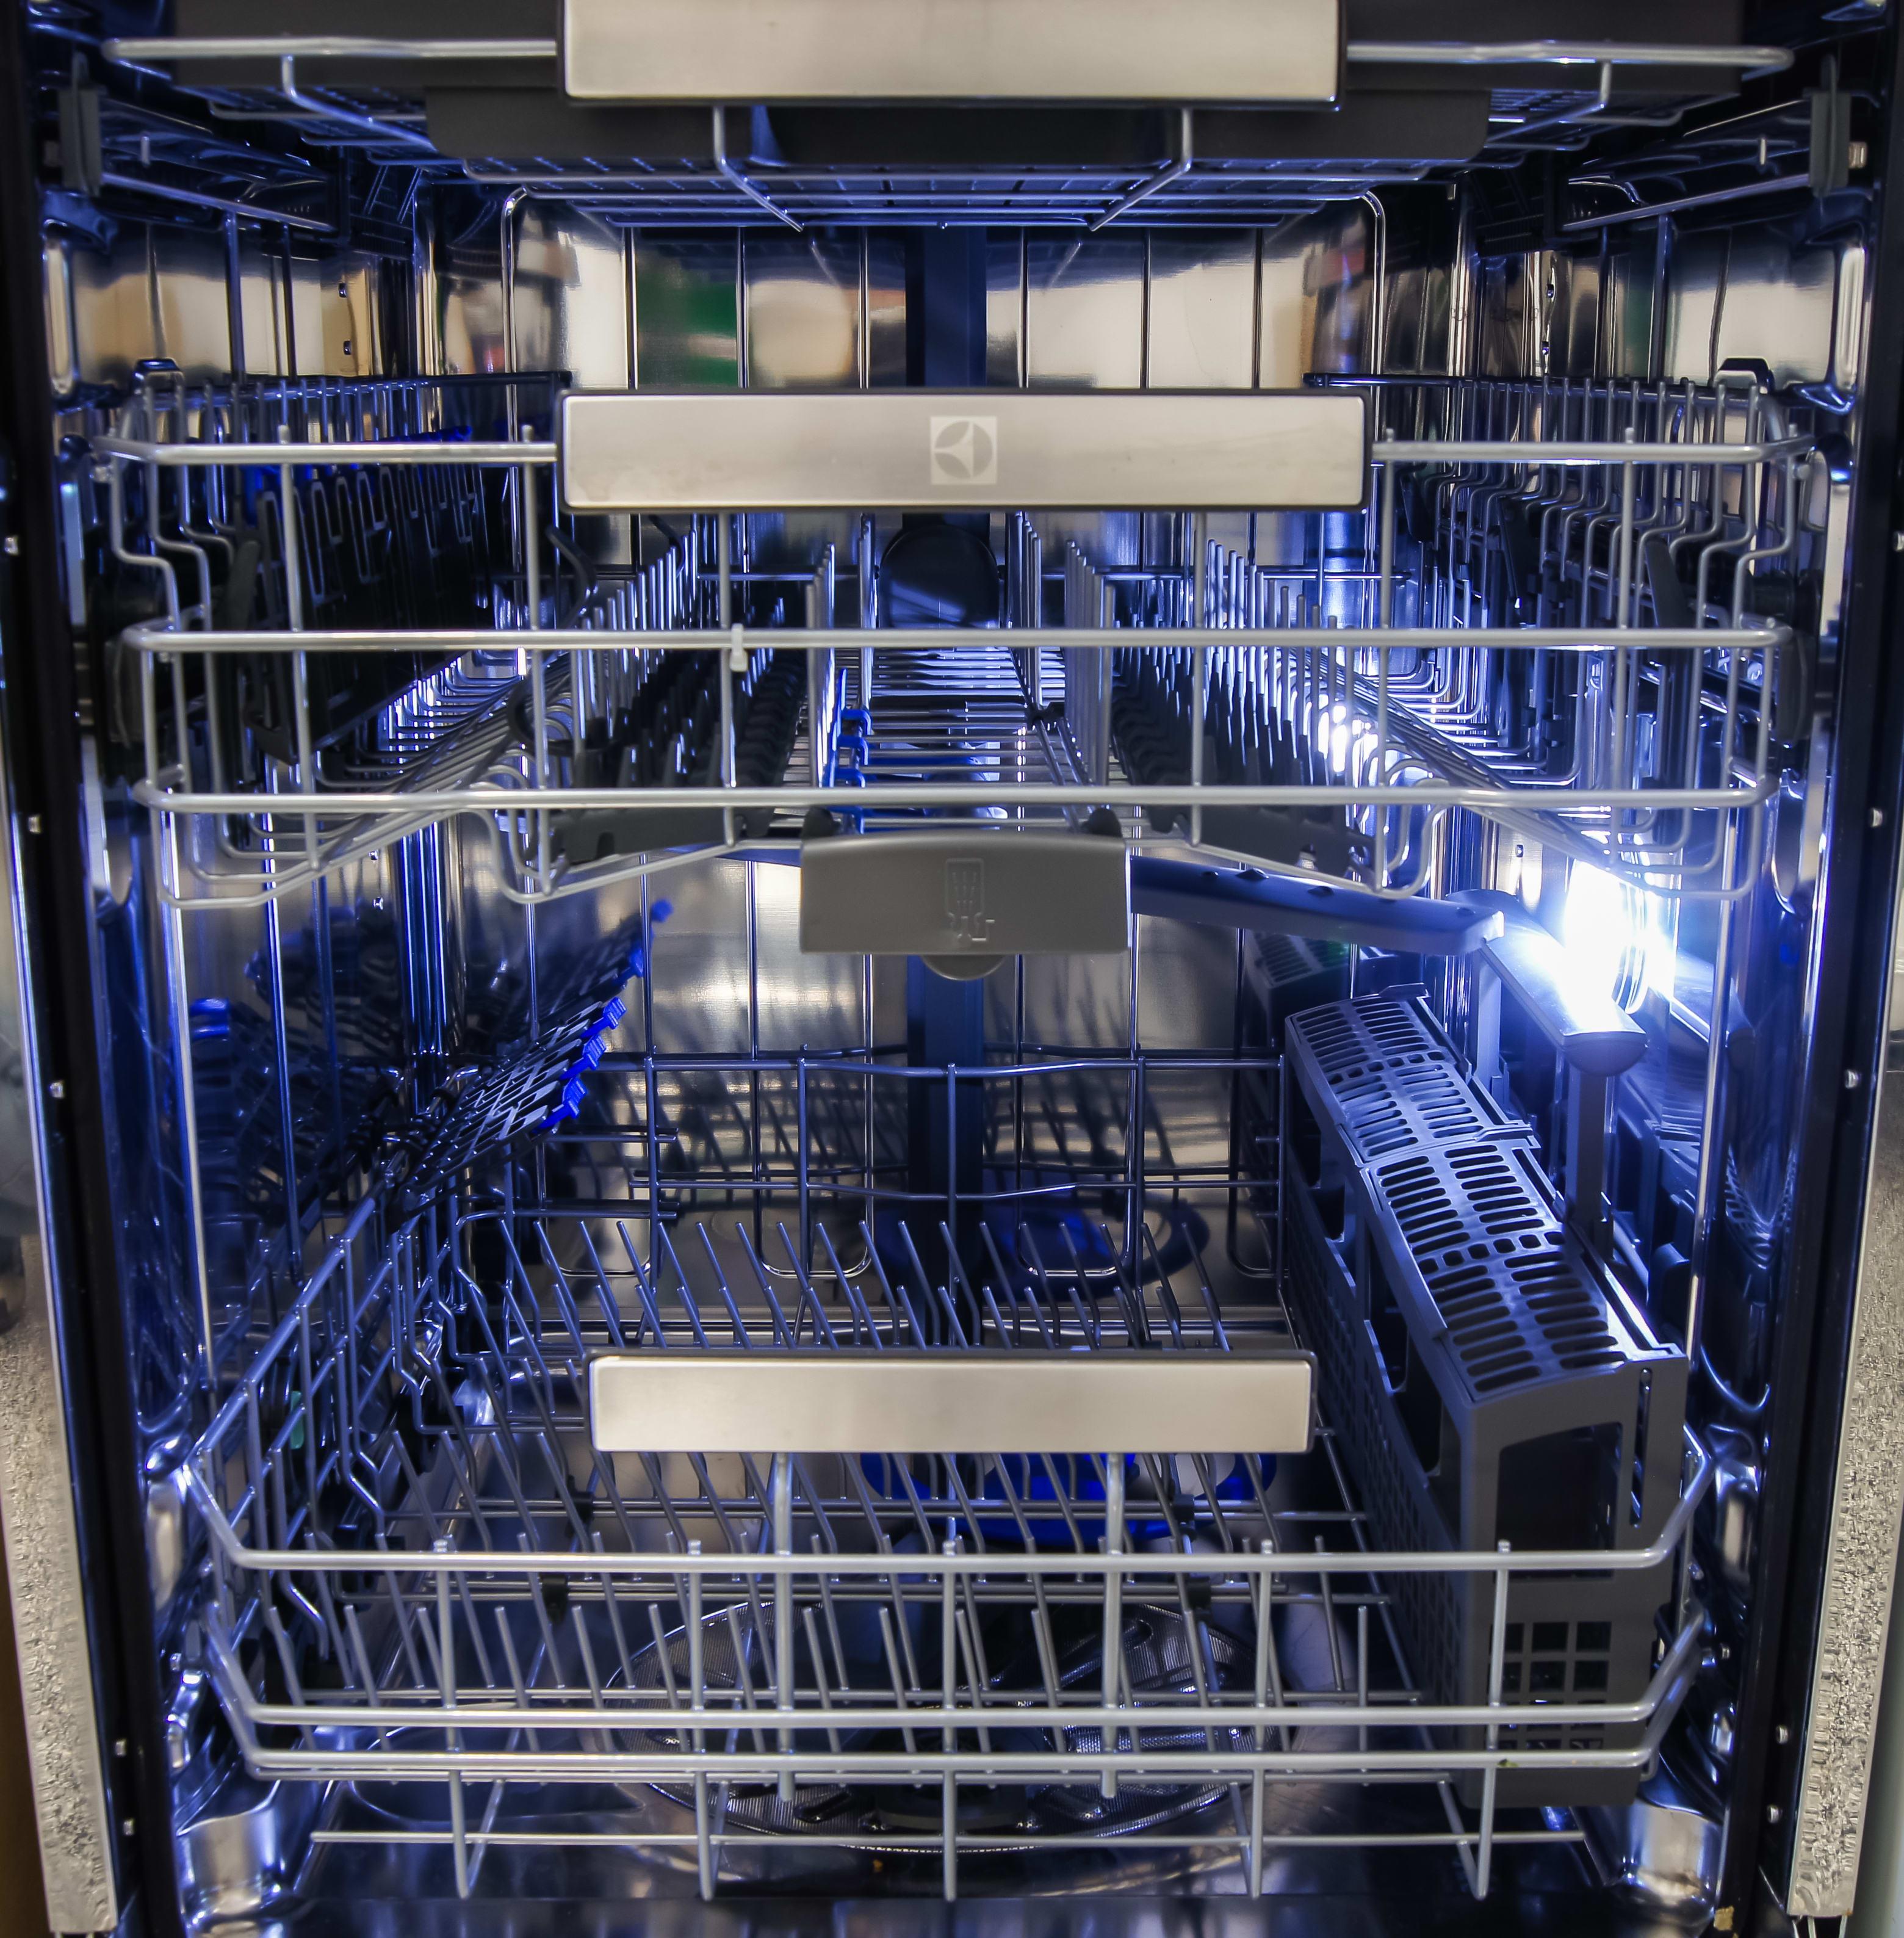 Electrolux EI24ID50QS Dishwasher Review - Reviewed Dishwashers